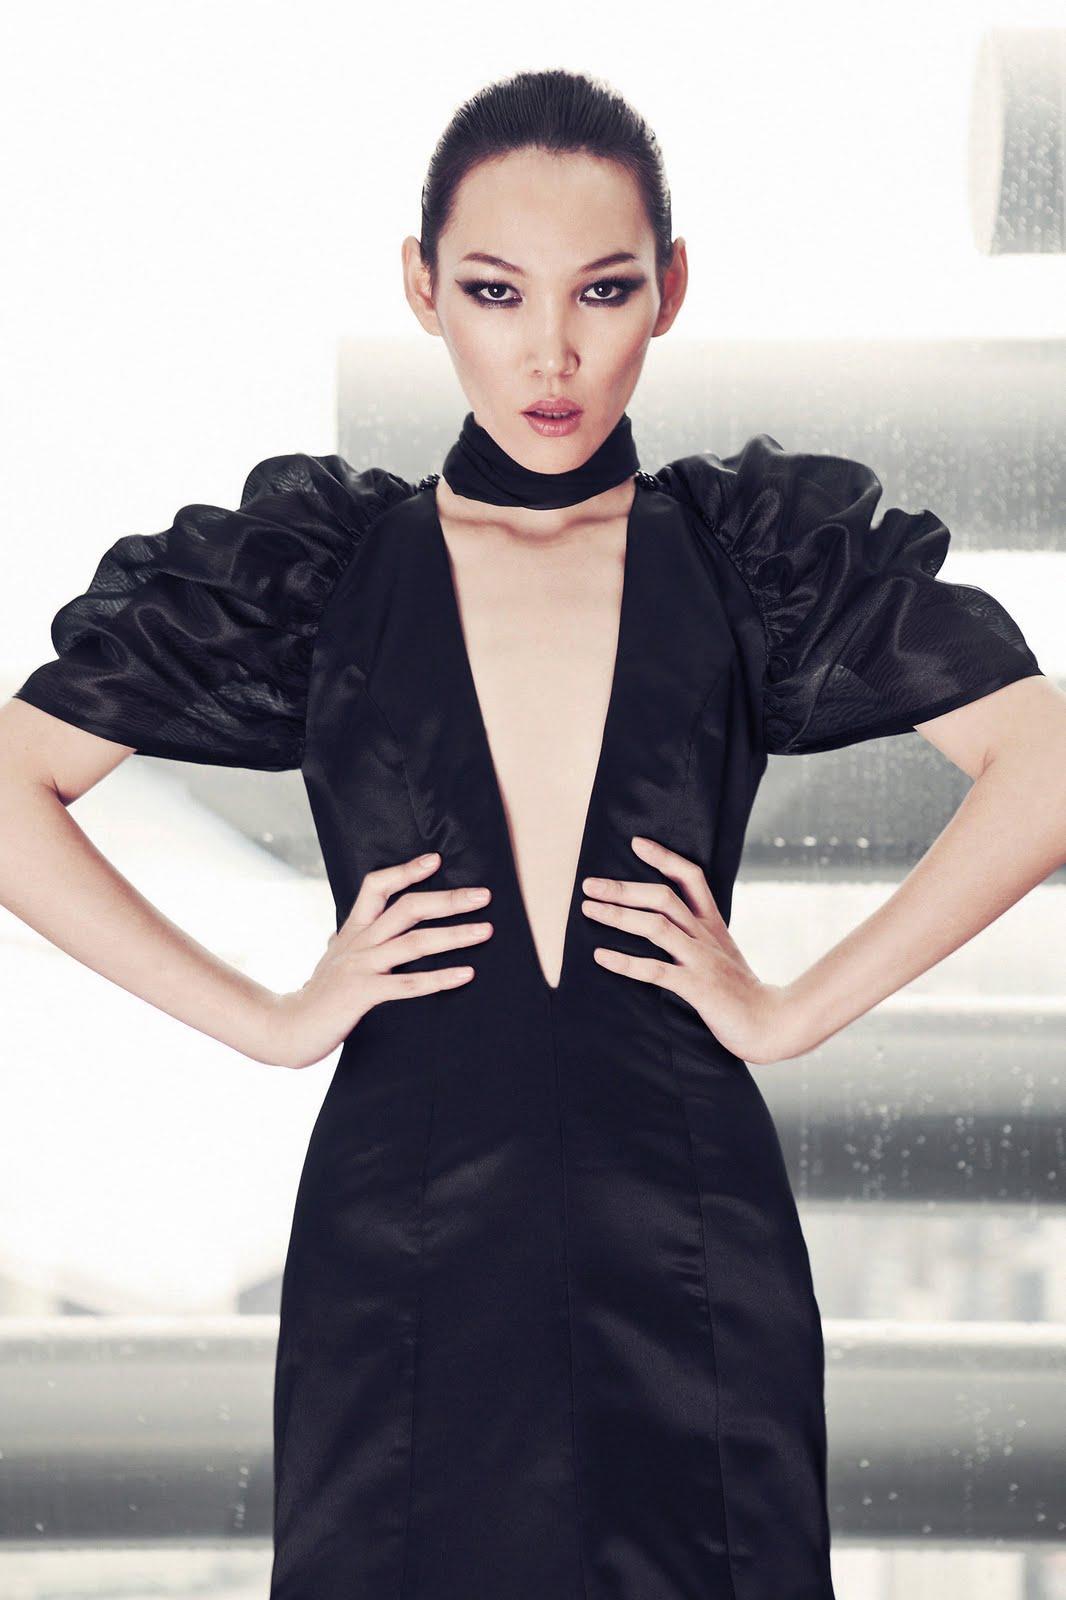 my makeupbox is a bomb!: High fashion makeup: dark angel